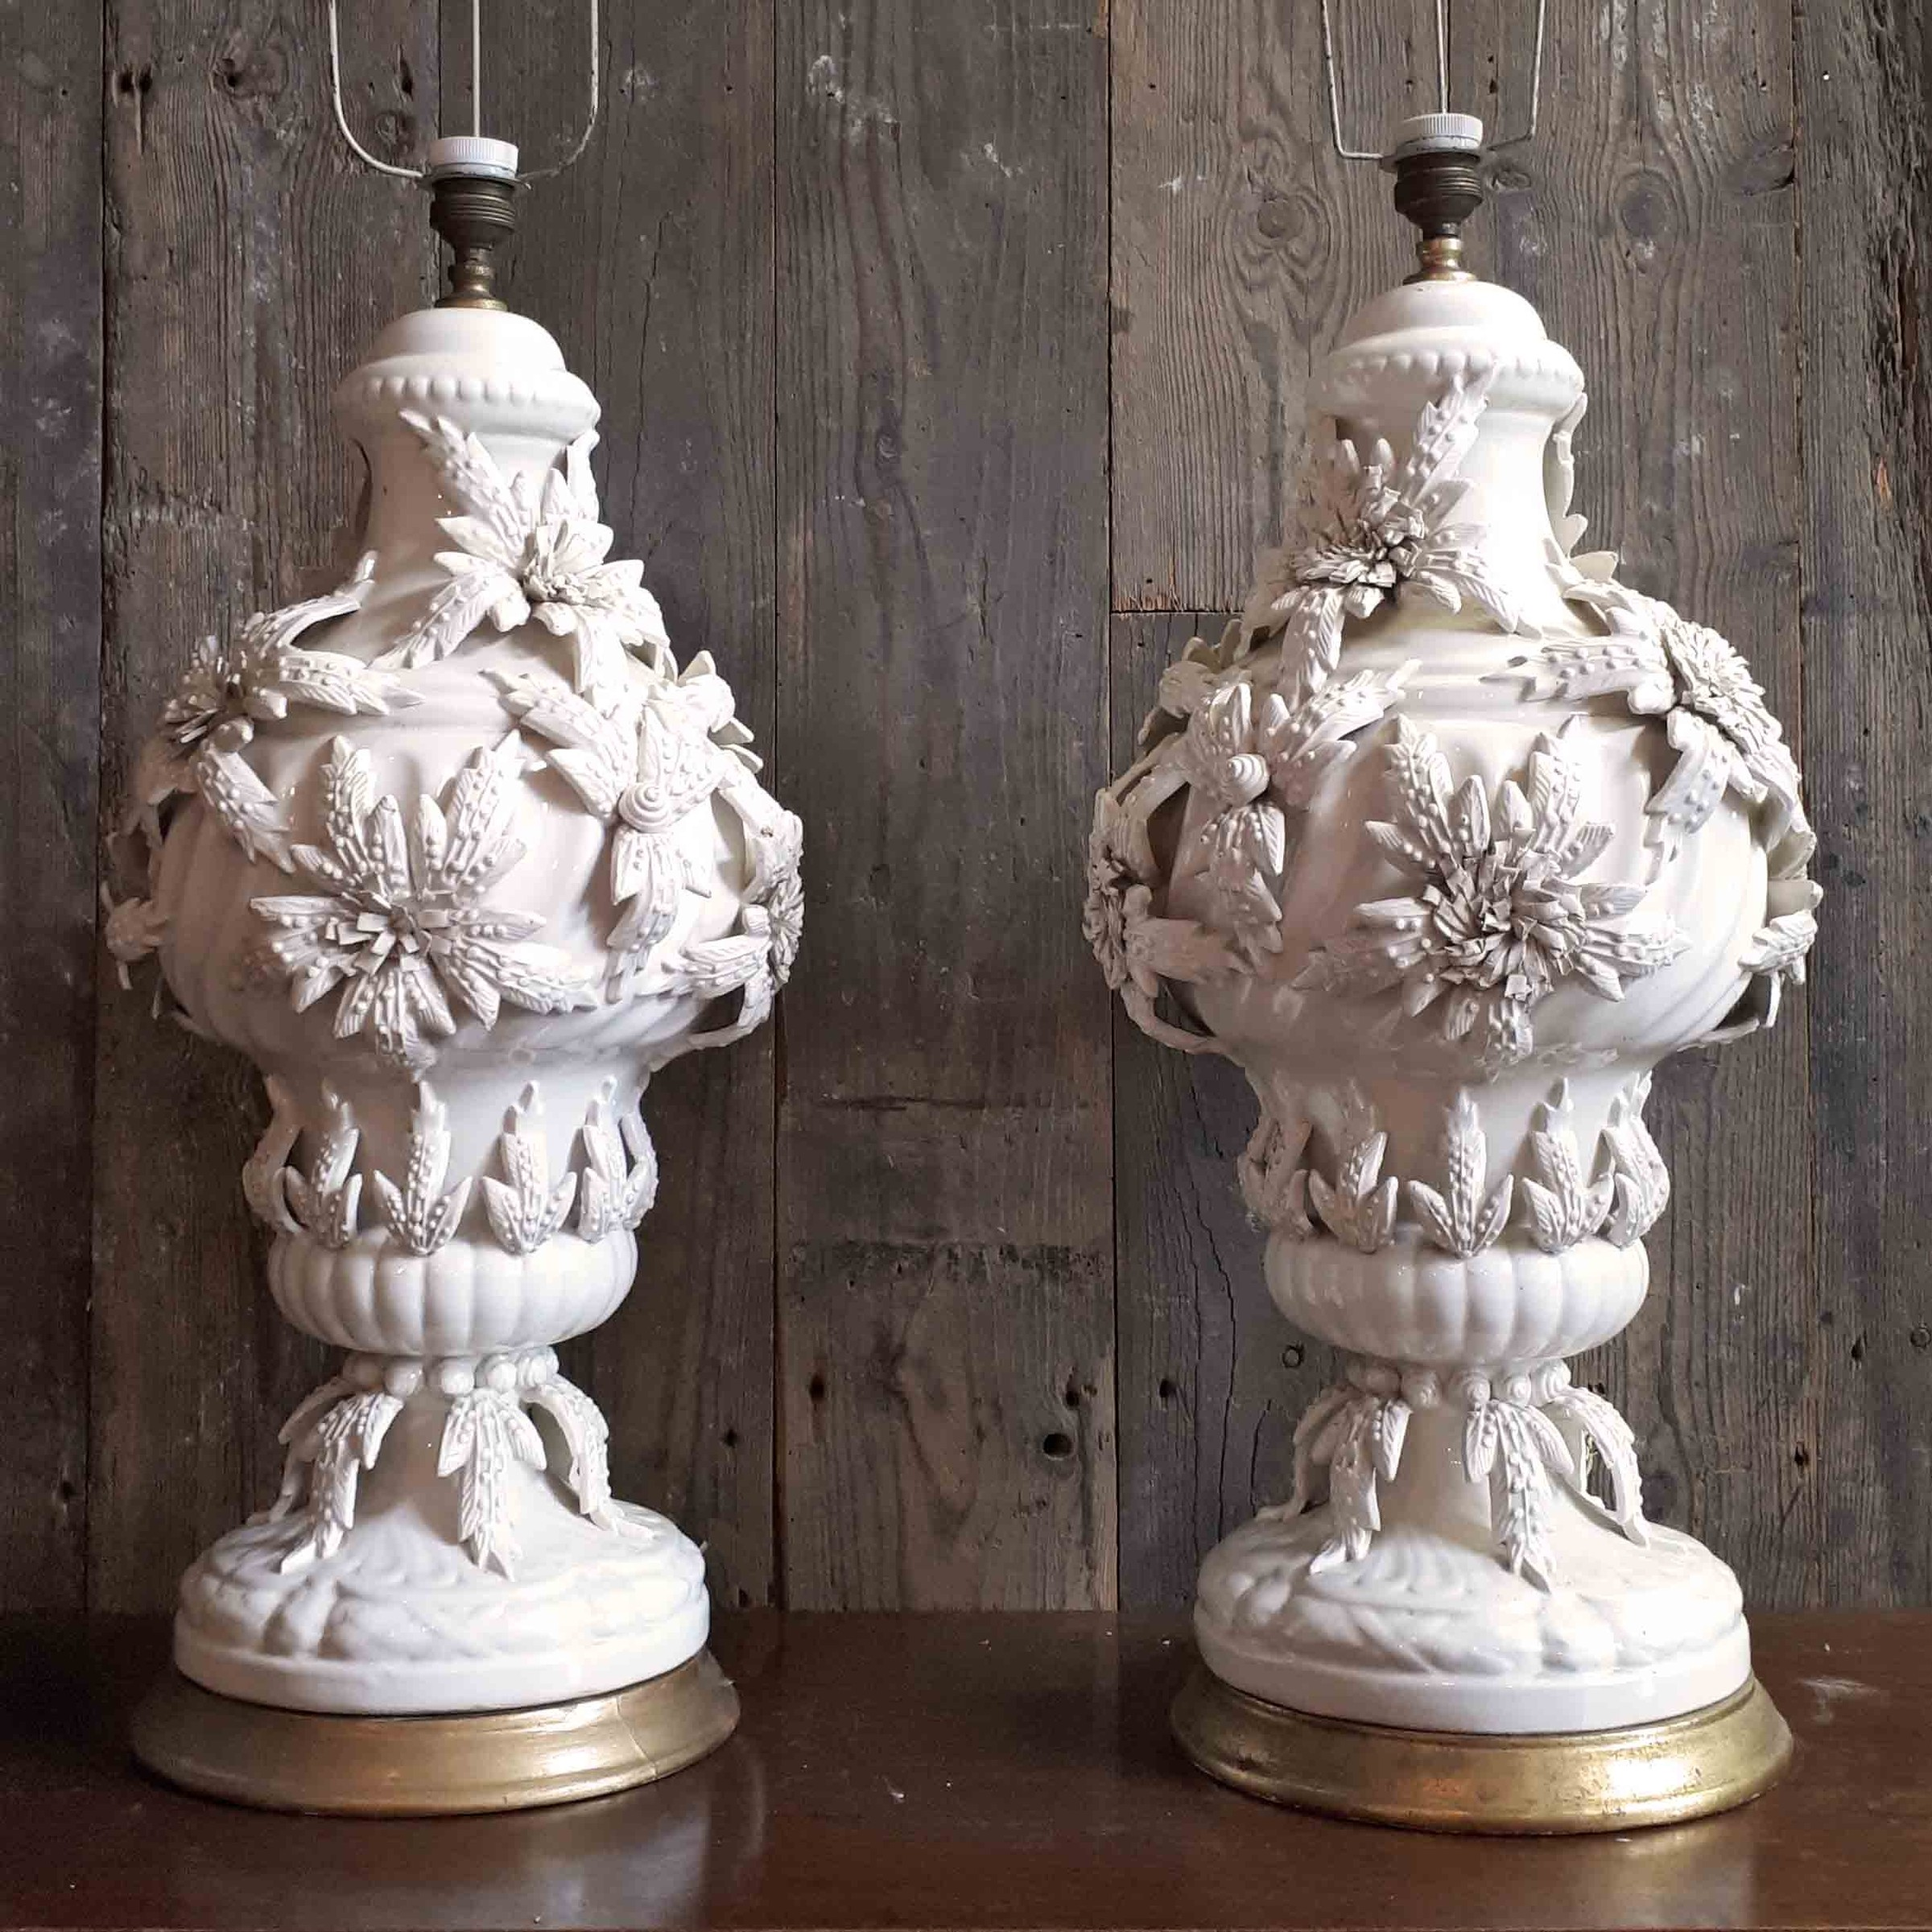 Paar Mid-Century Manises Tischlampengestelle